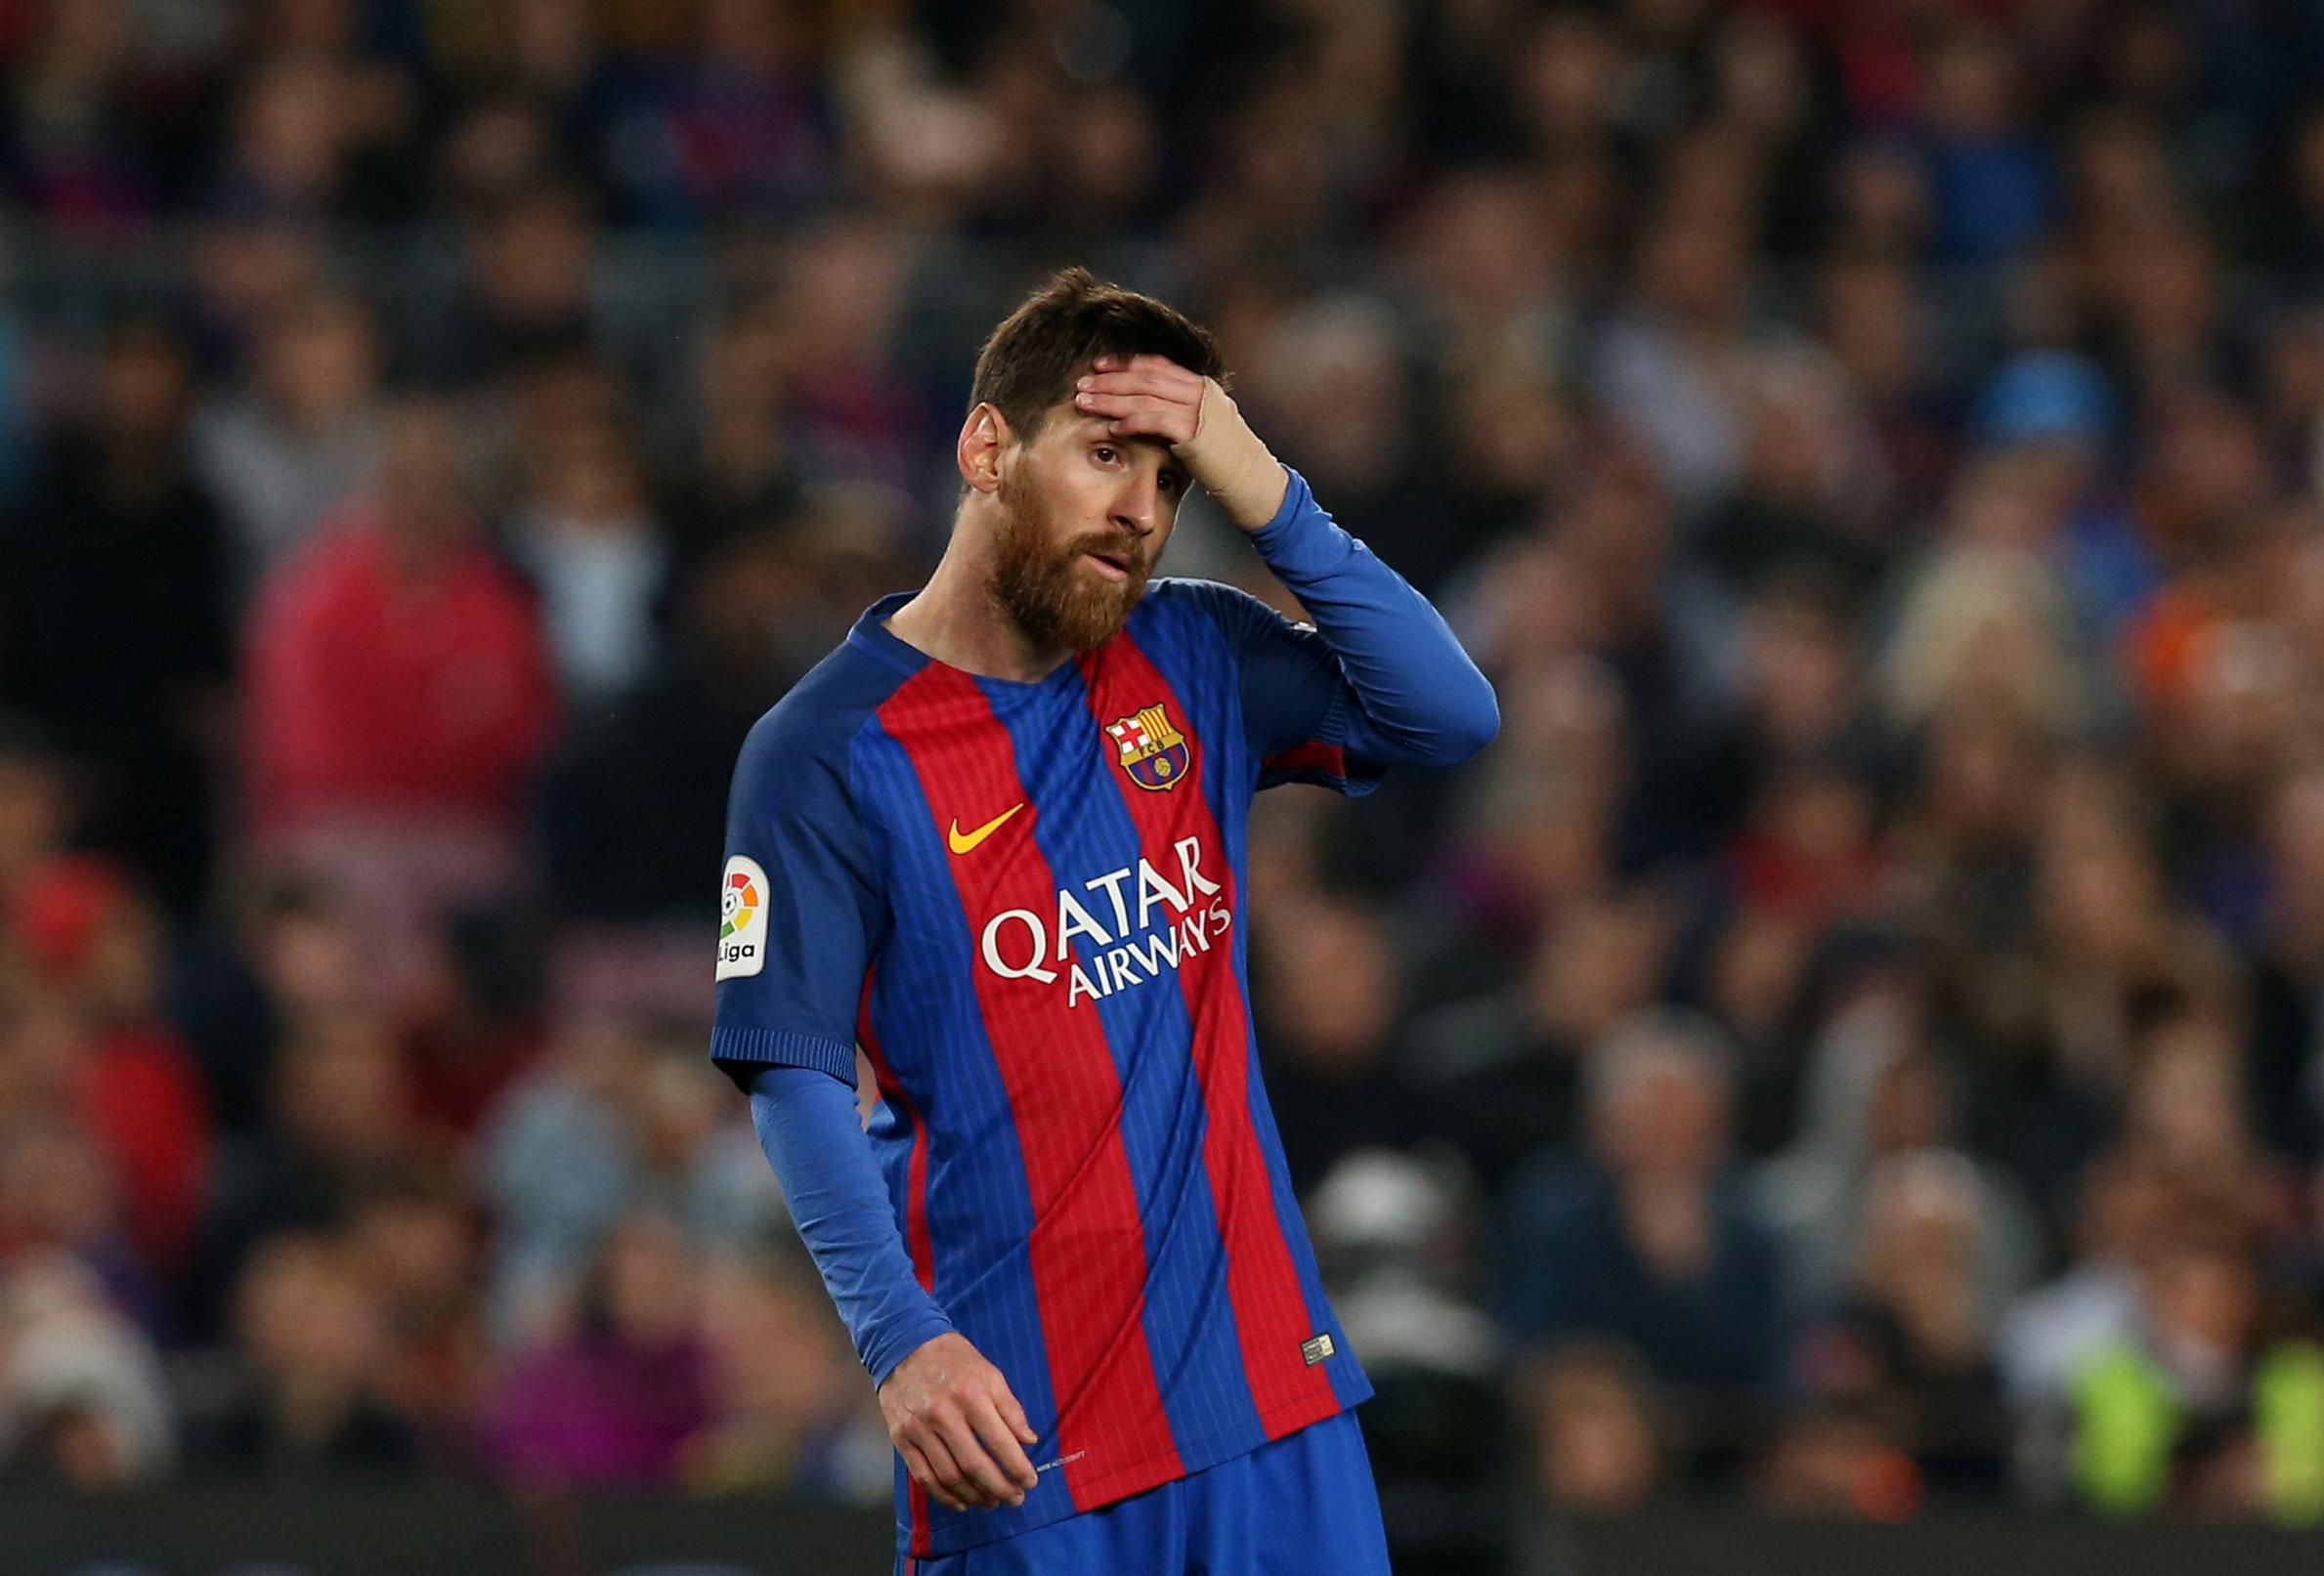 FIFA reduciría sanción a Messi si acude a audiencia en Suiza